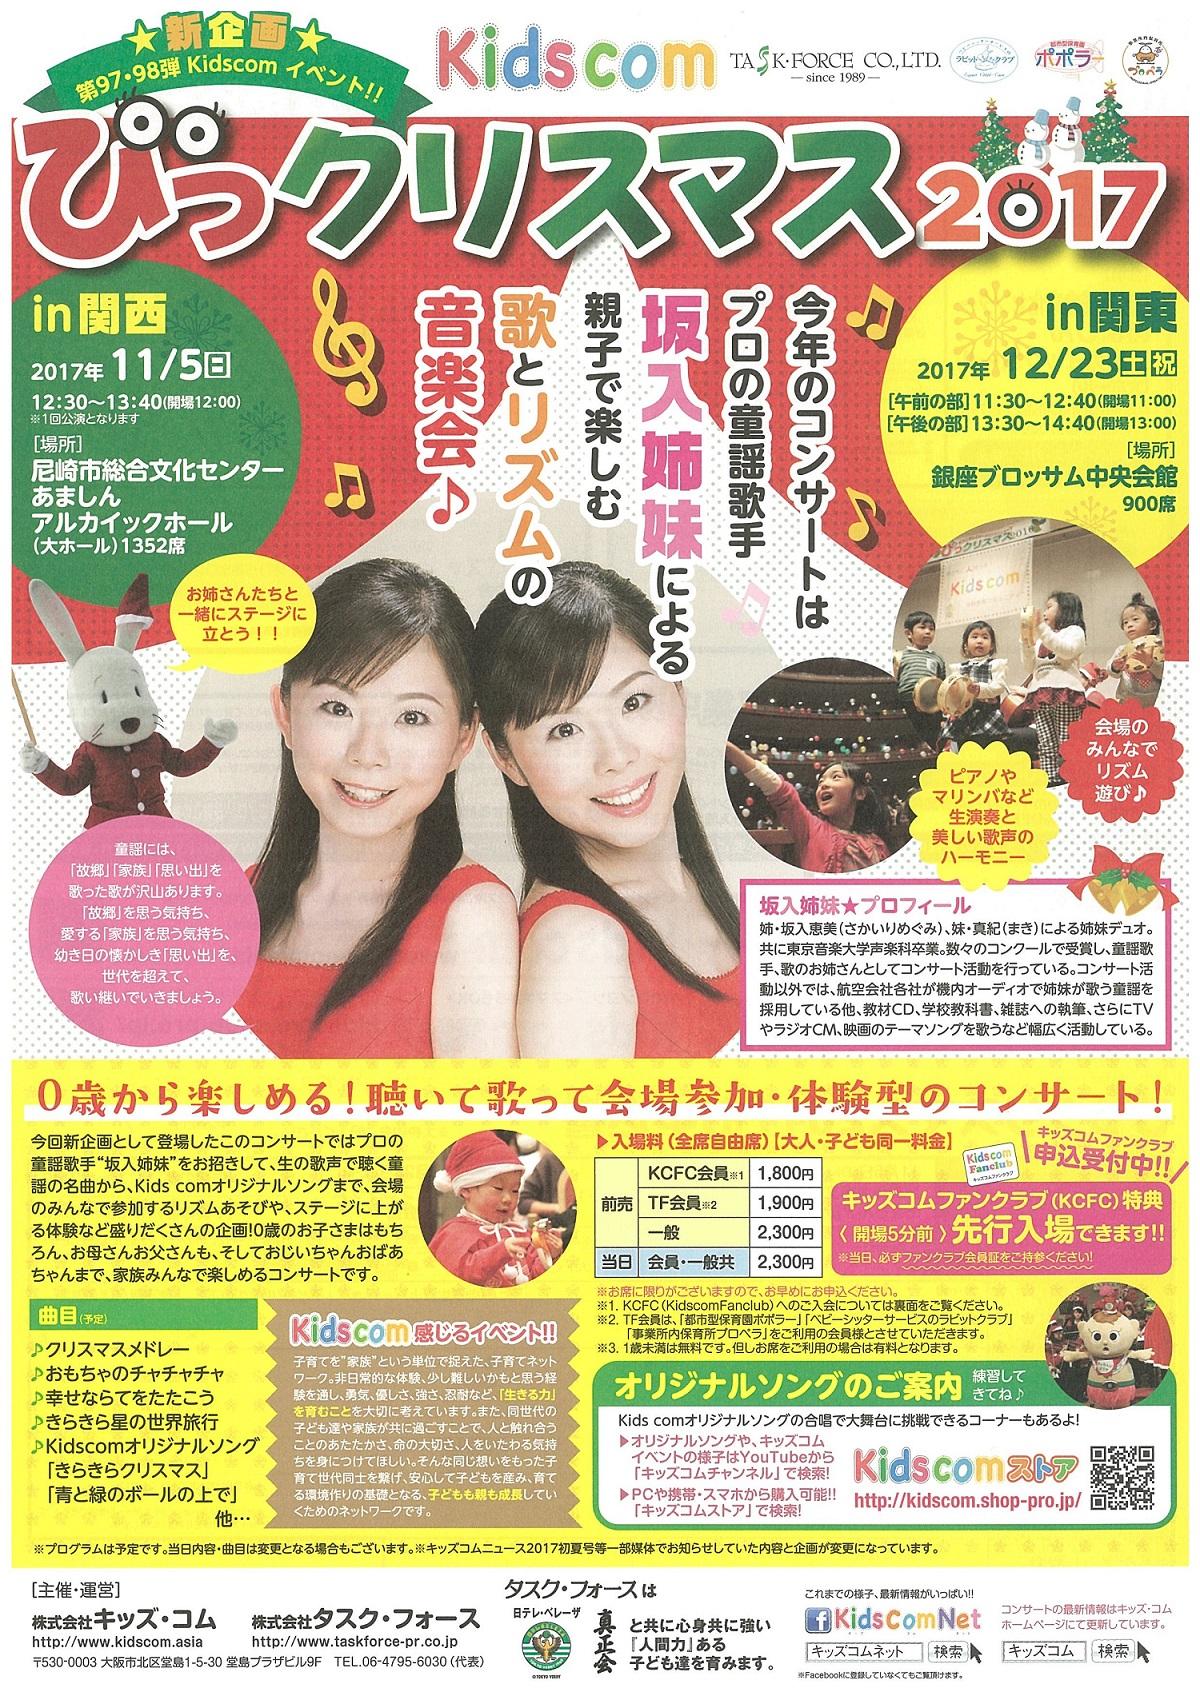 Kids com  びっクリスマス2017 in 関東